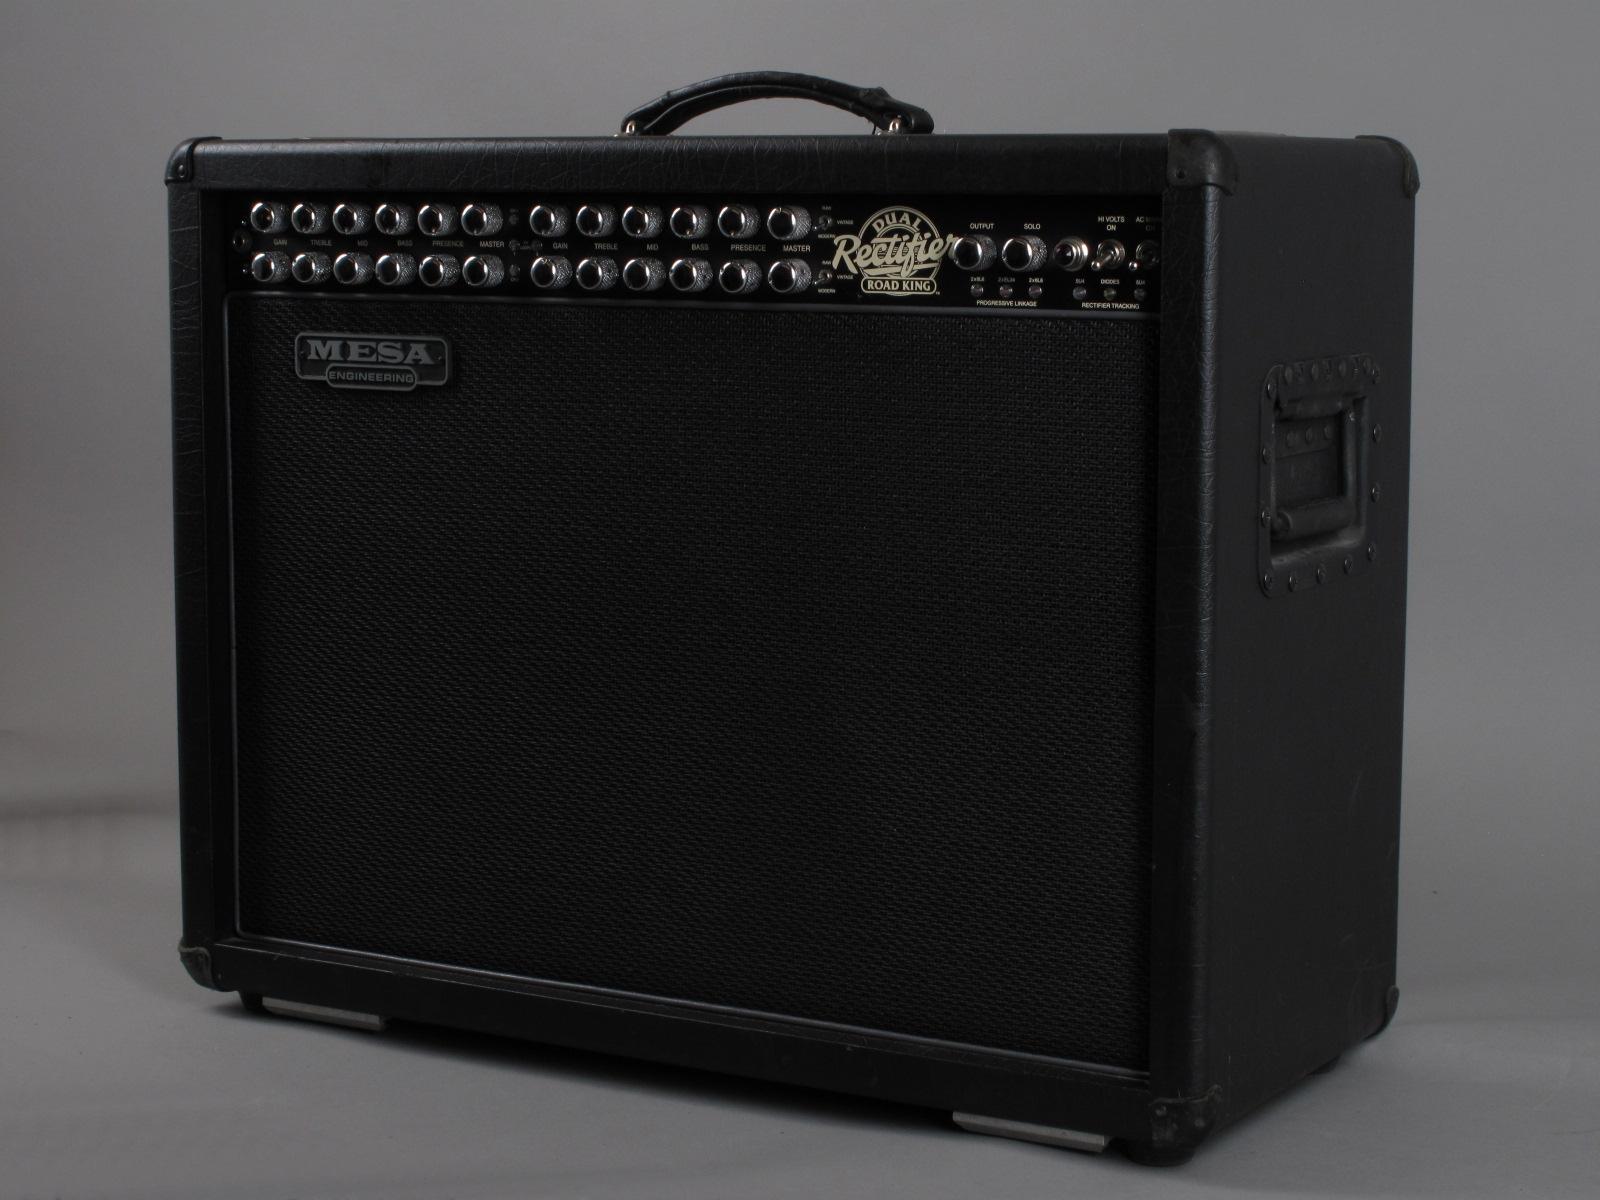 https://guitarpoint.de/app/uploads/products/2003-mesa-dual-rectifier-road-king/2003-Mesa-Dual-Rectifier-Road-King_2.jpg